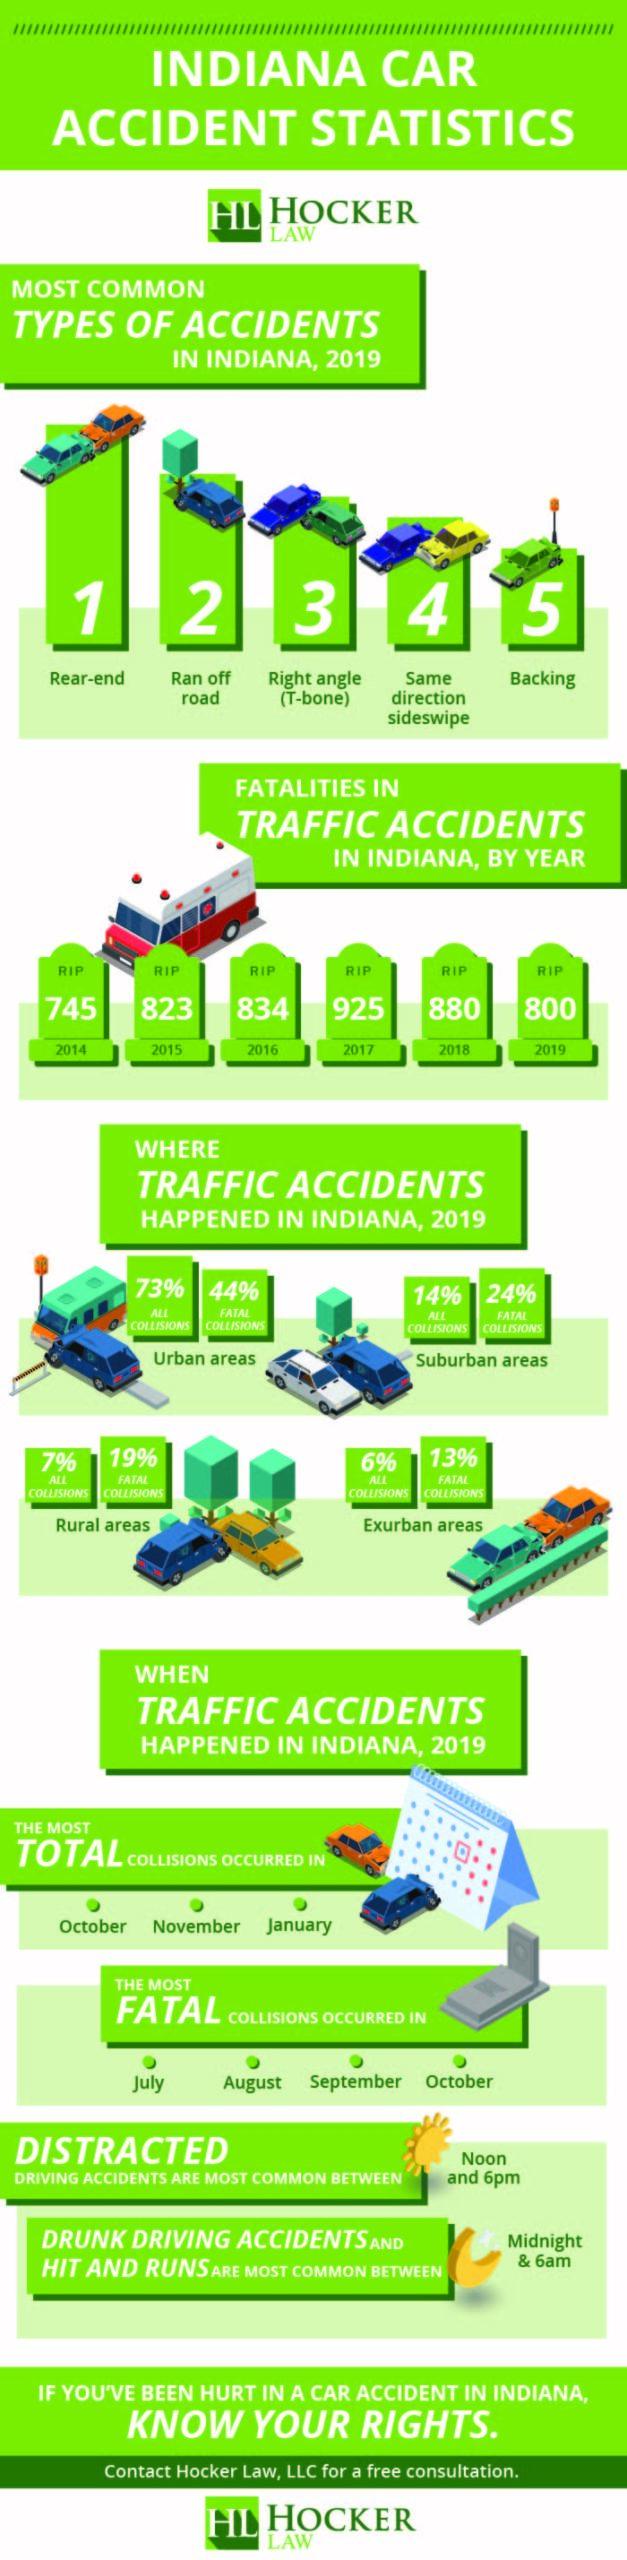 Indiana Car Accident Statistics infographic